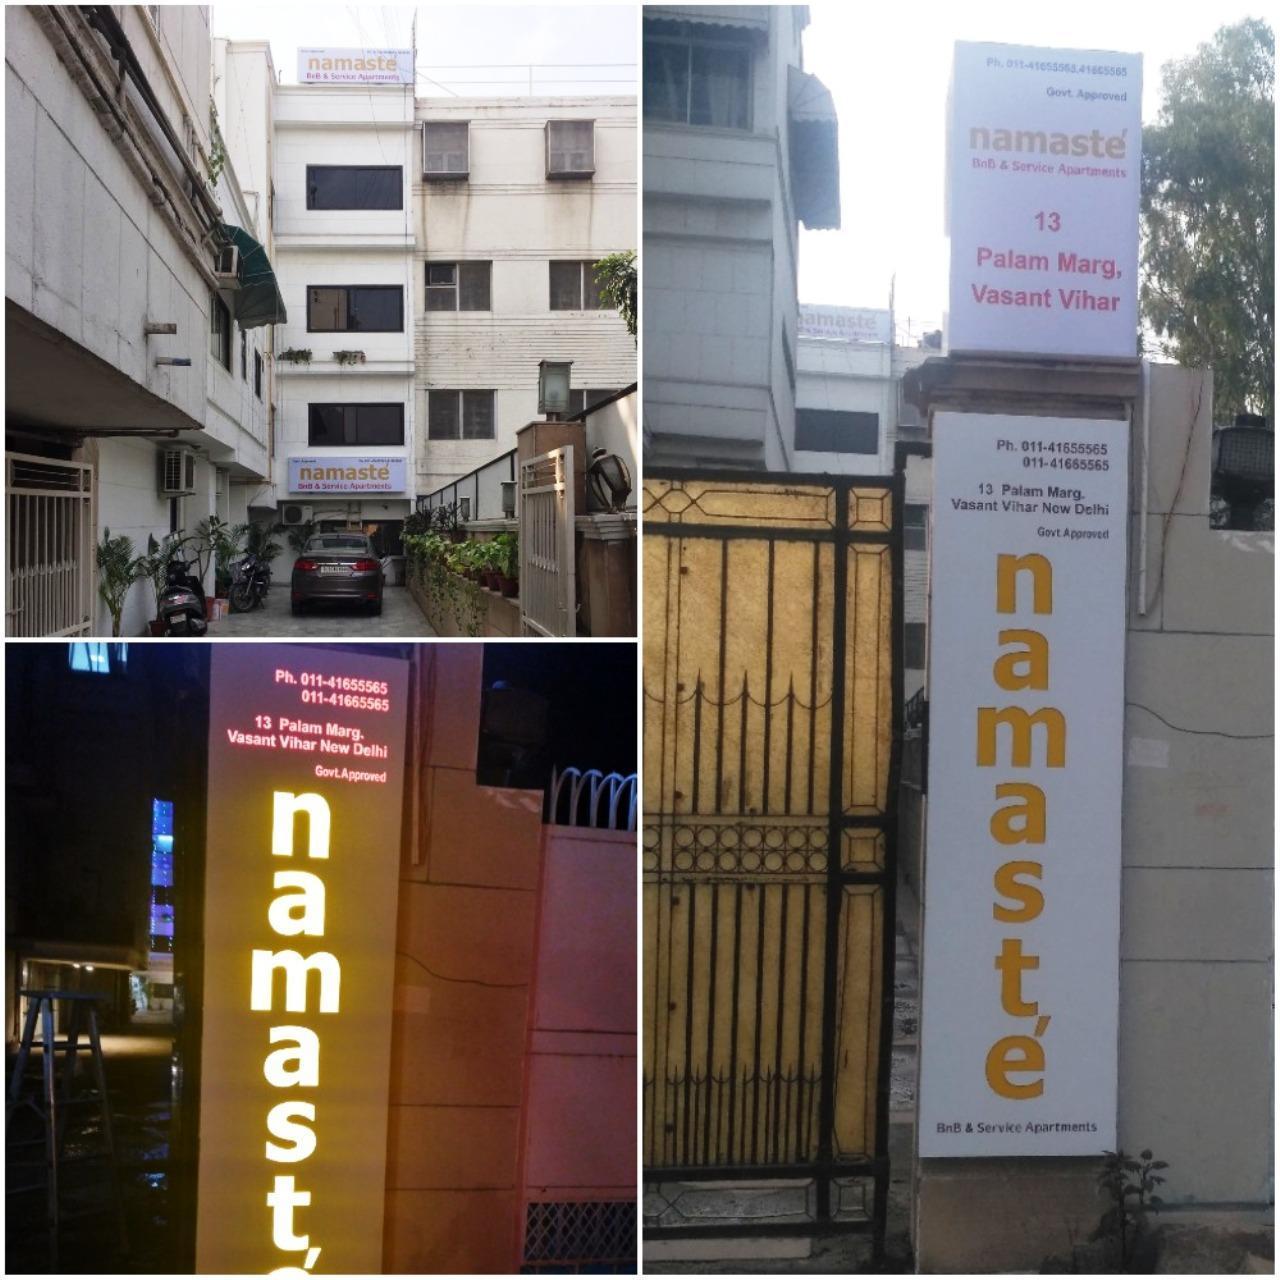 Discount Namaste BnB & Service Apartments